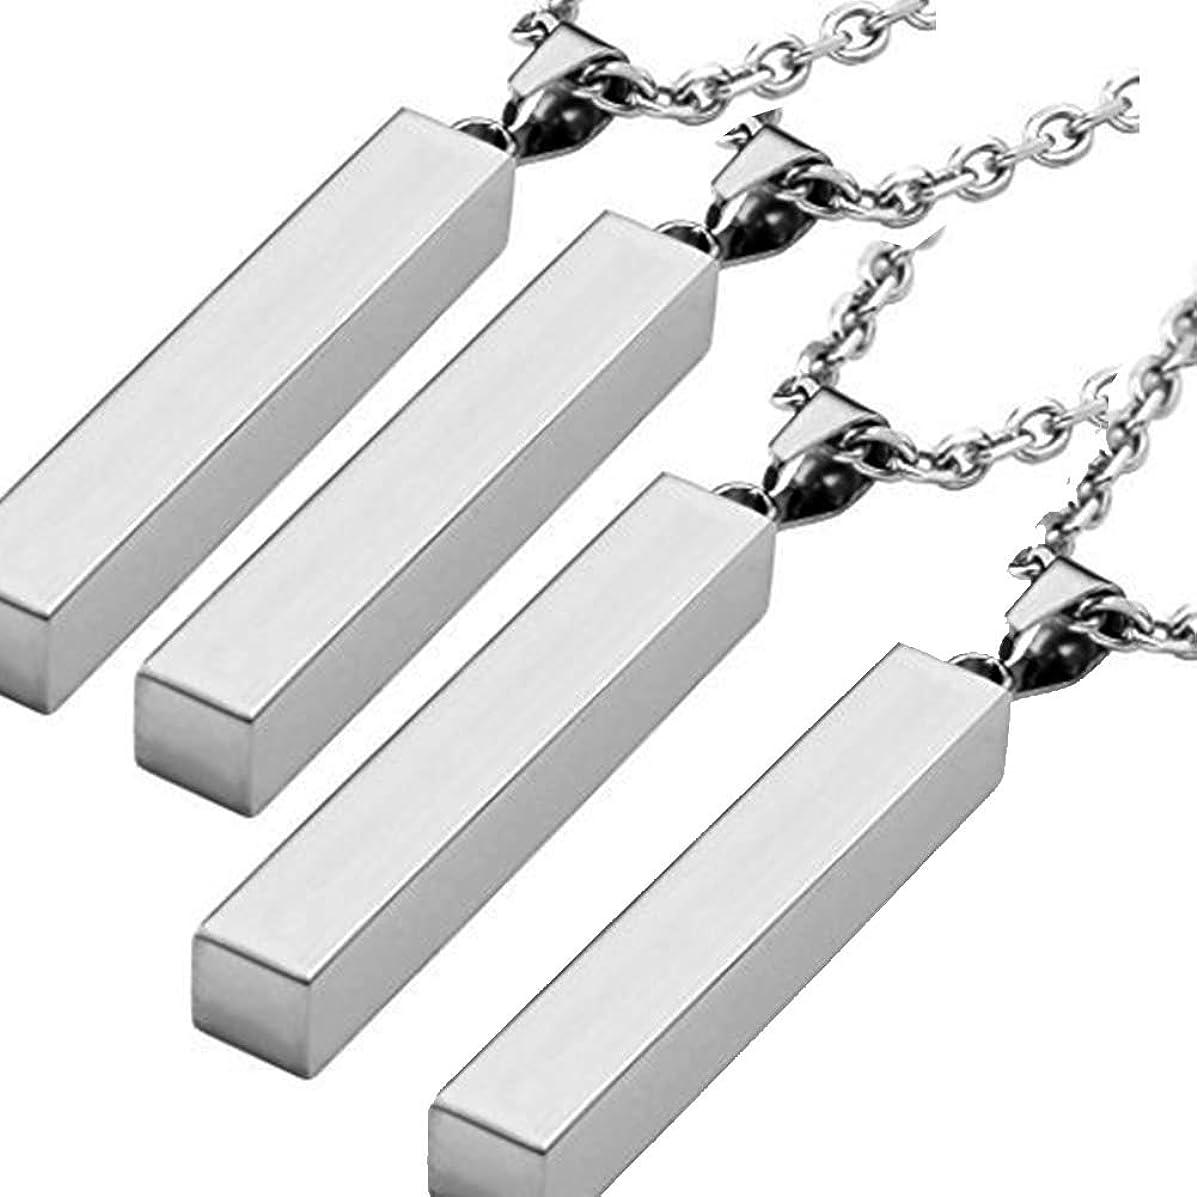 NationInFashion 4 x Stainless bar Necklace Blank | bar Stamping Blank | Stainless Stamping Blank| bar Necklace Stainless Steel| Stainless Stamping bar